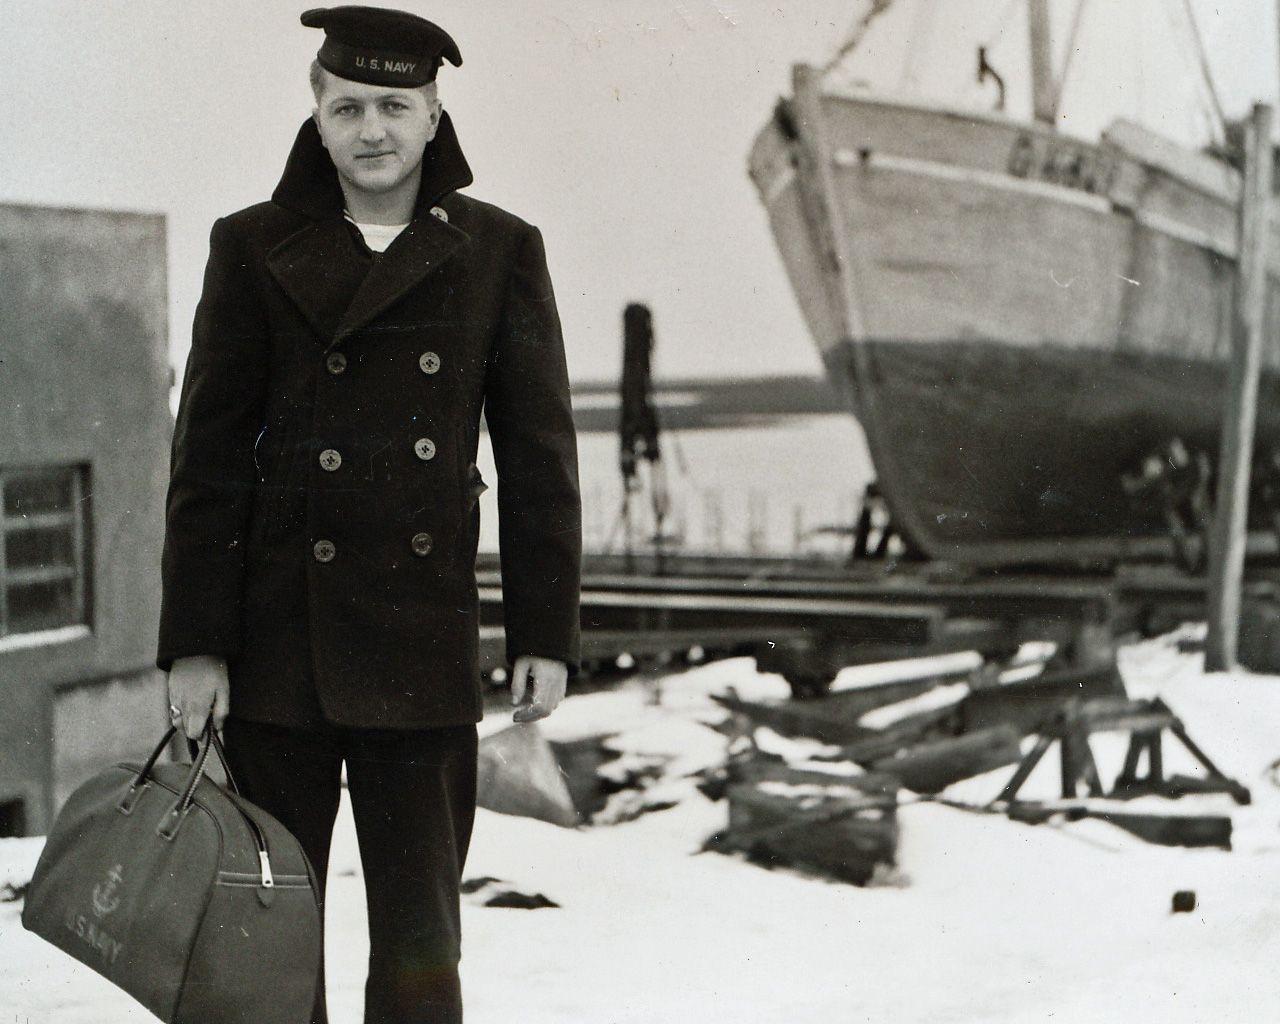 Pea coat mantel der us navy